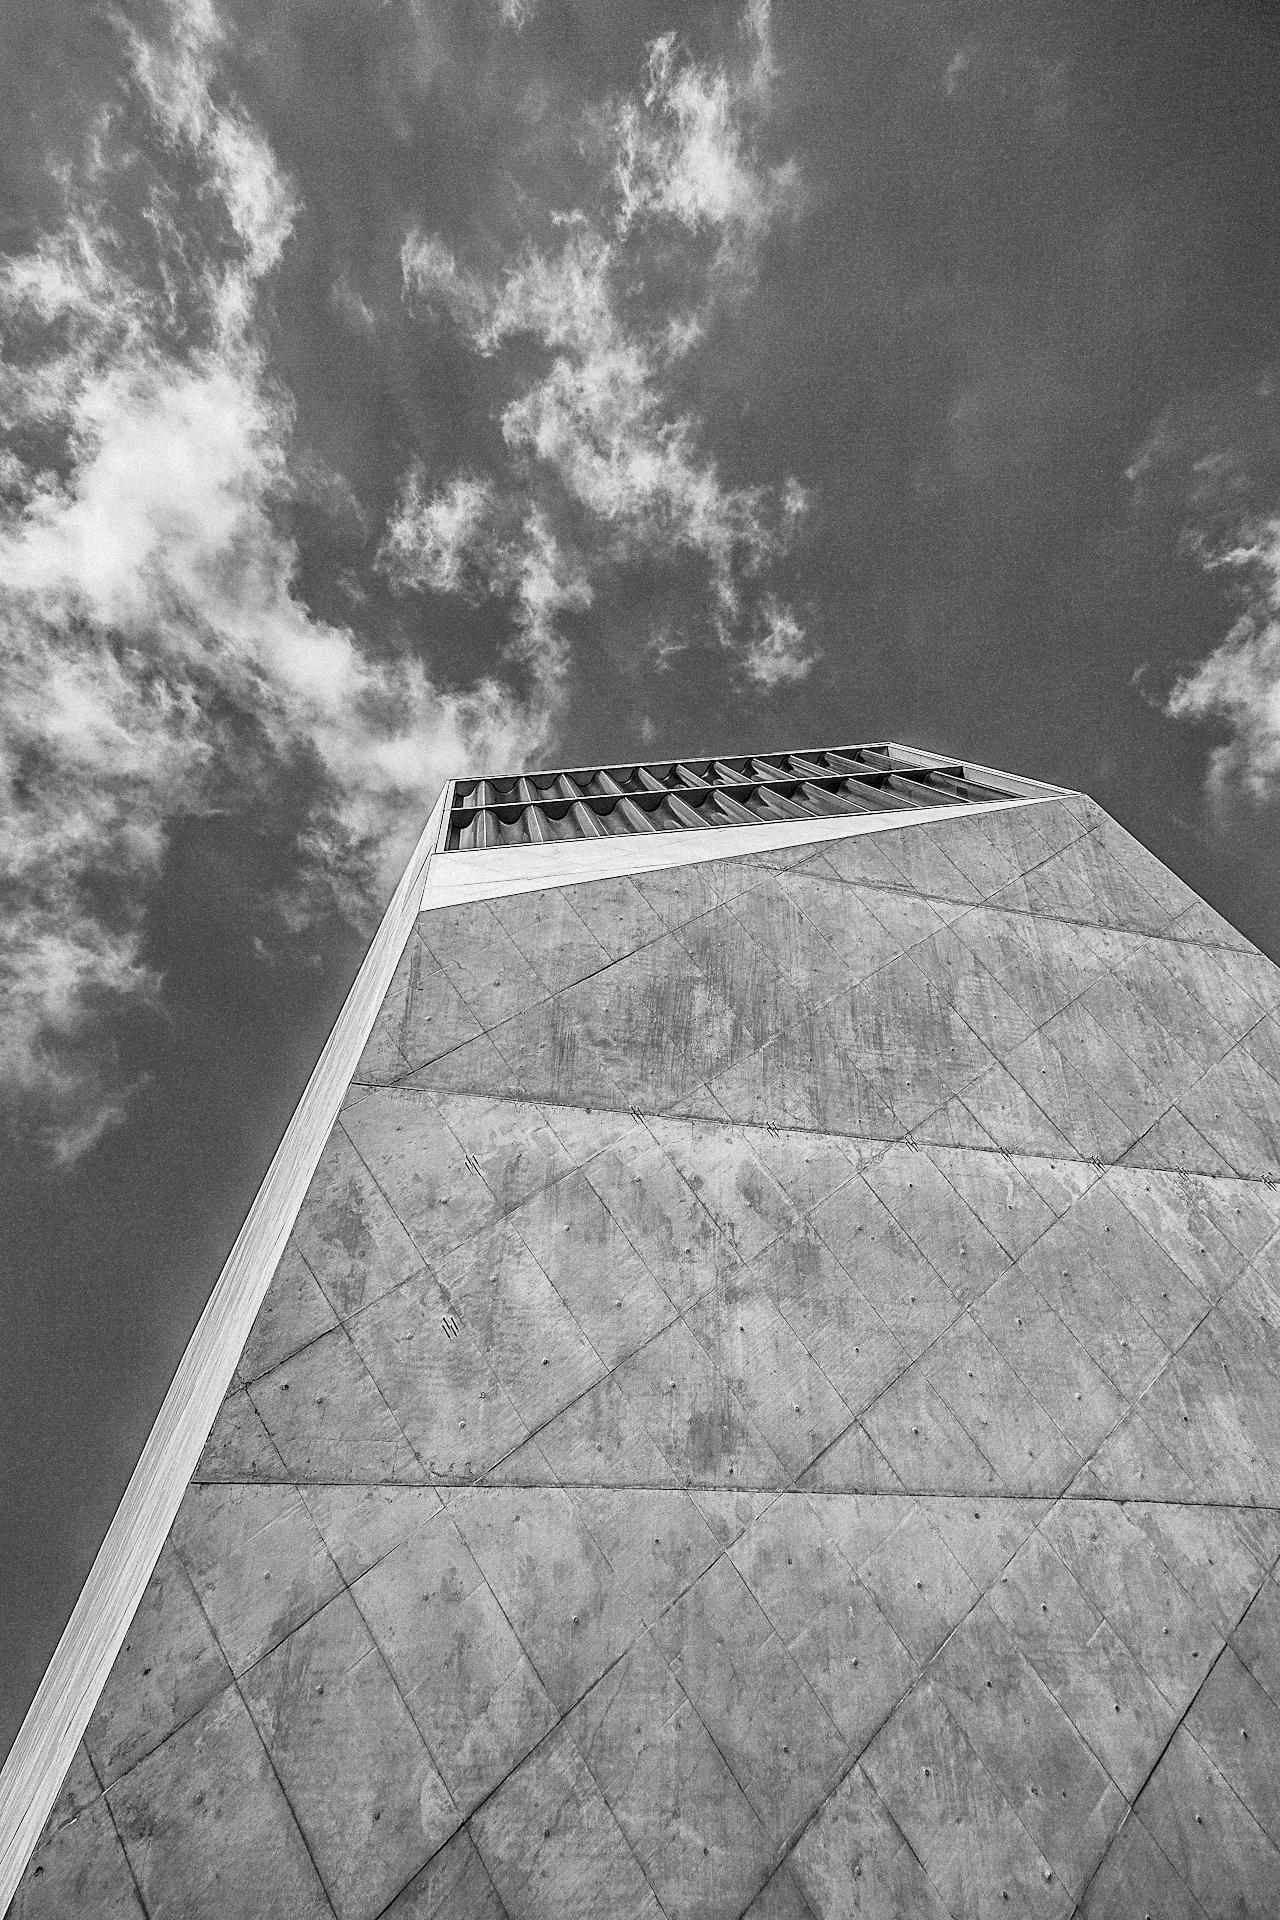 10-Aniversario-Casa-da-Musica-Porto-Reportagem-Fotografica-Photographic-Coverage-Fotografia-Photography-Arquitectura-Architecture-Rem-Koolhaas-bonjourmolotov-40N.jpg